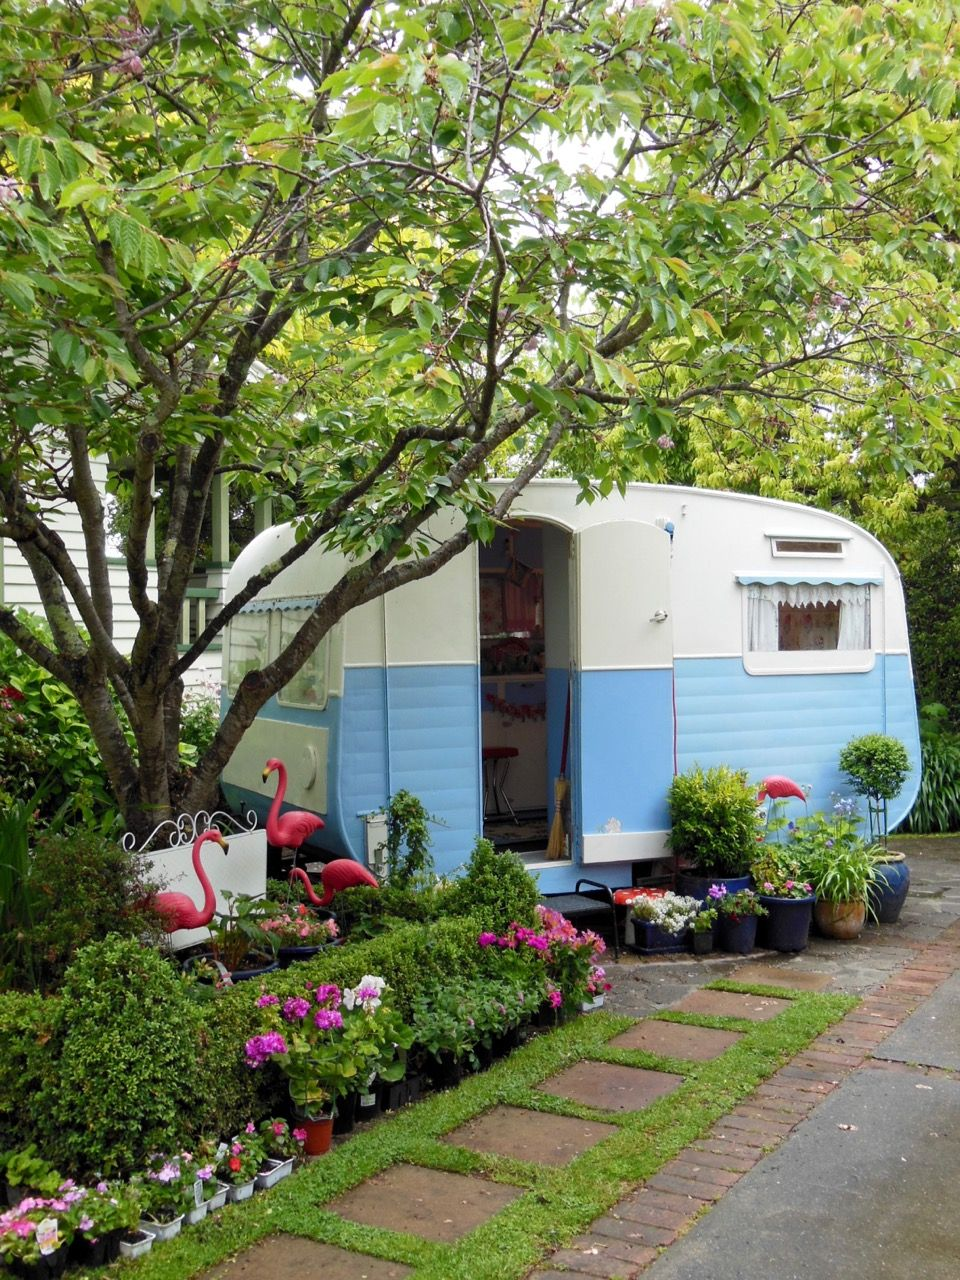 Sweet Little Backyard Tiny Trailer Tiny House Retro Caravan Vintage Camper Sky Blue O Caravane Retro Caravane Vintage Caravane Deco